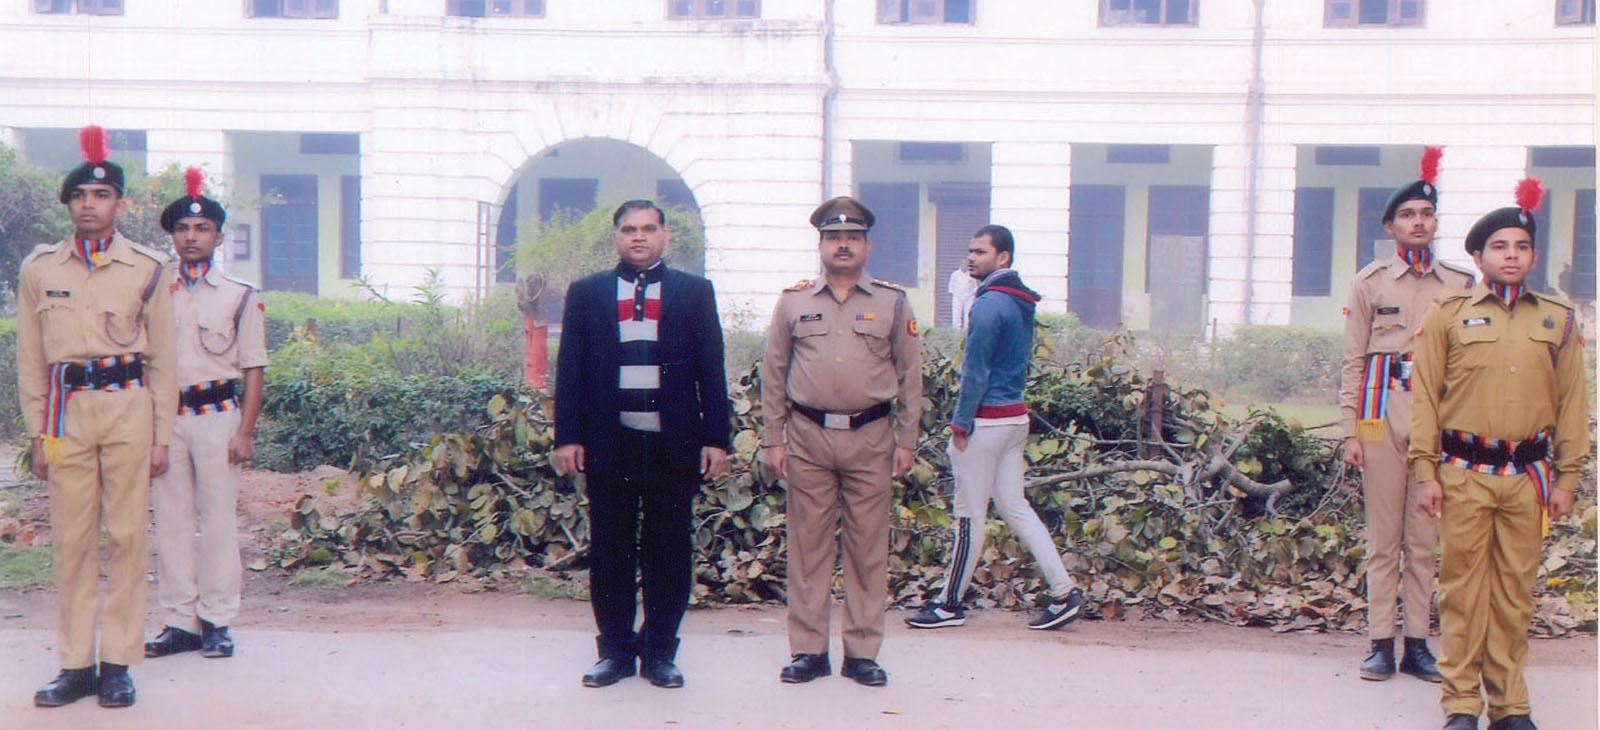 Bihar National College Patna - BN College Patna - www bncollegepatna com